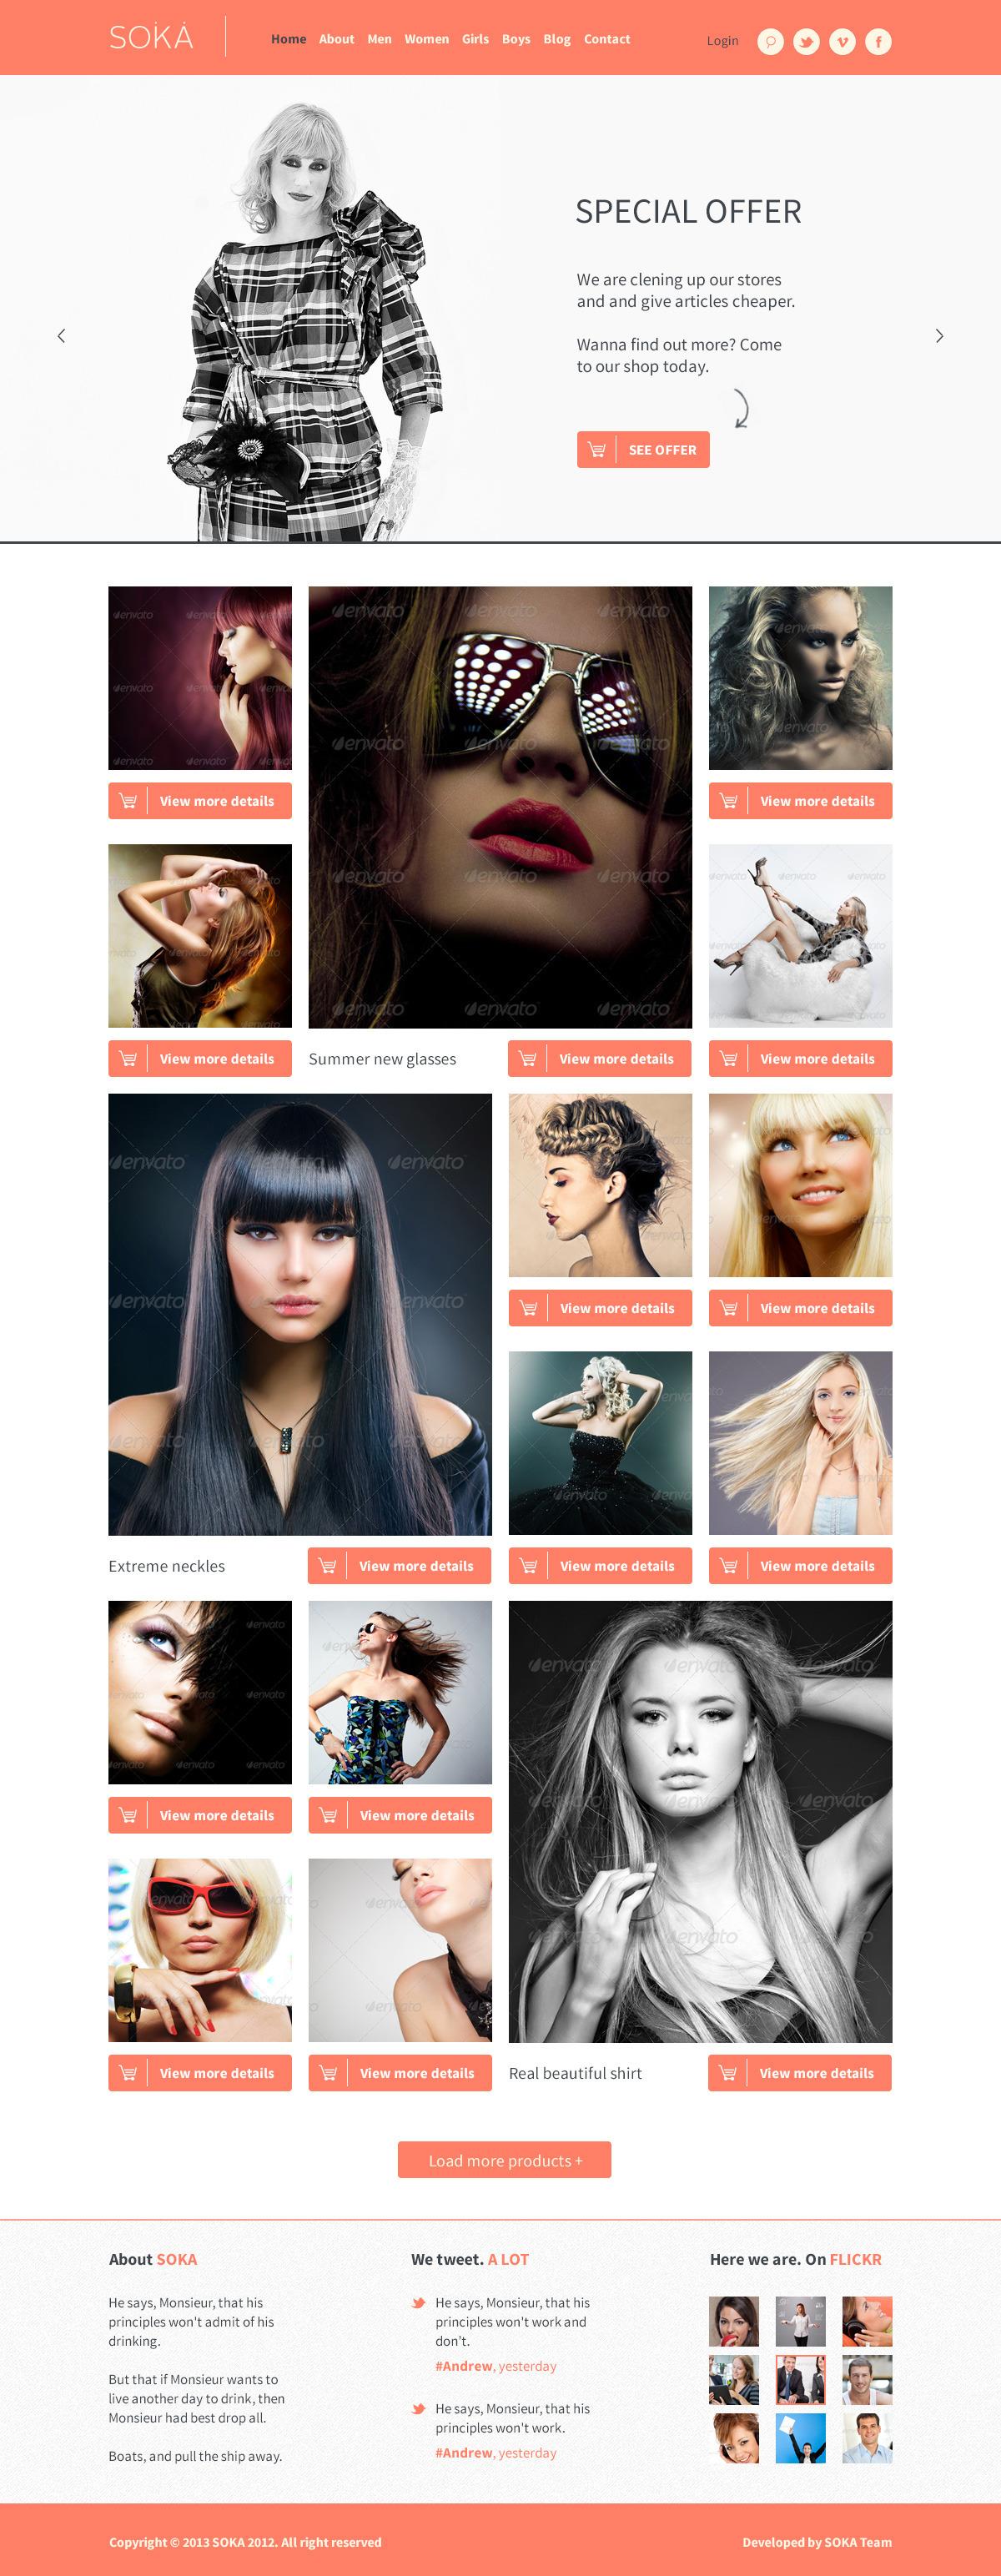 SOKA - PSD Templates Fashion Online Shop